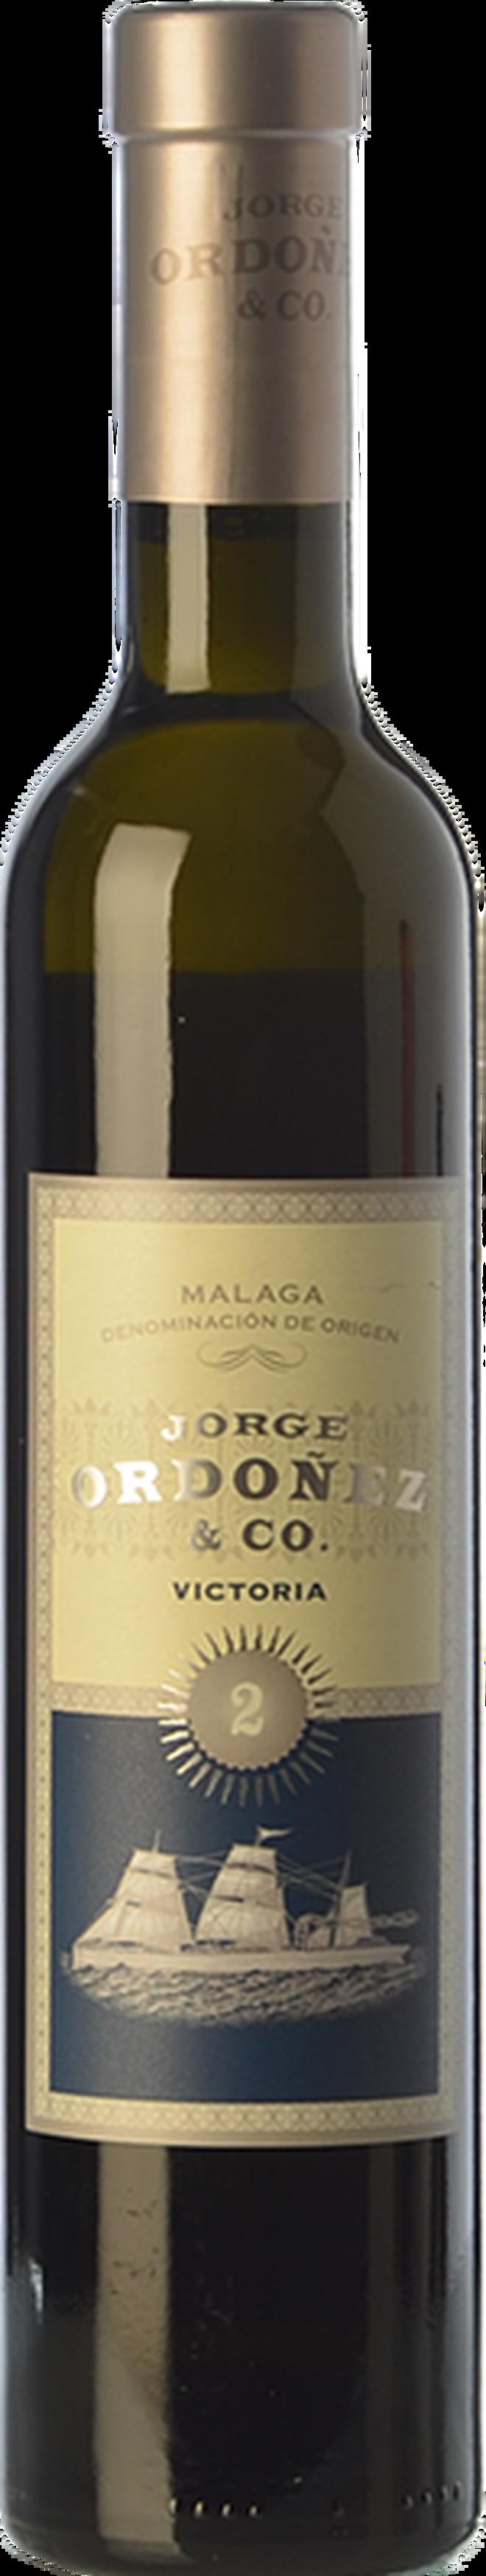 Victoria Nº 2 Jorge Ordóñez.